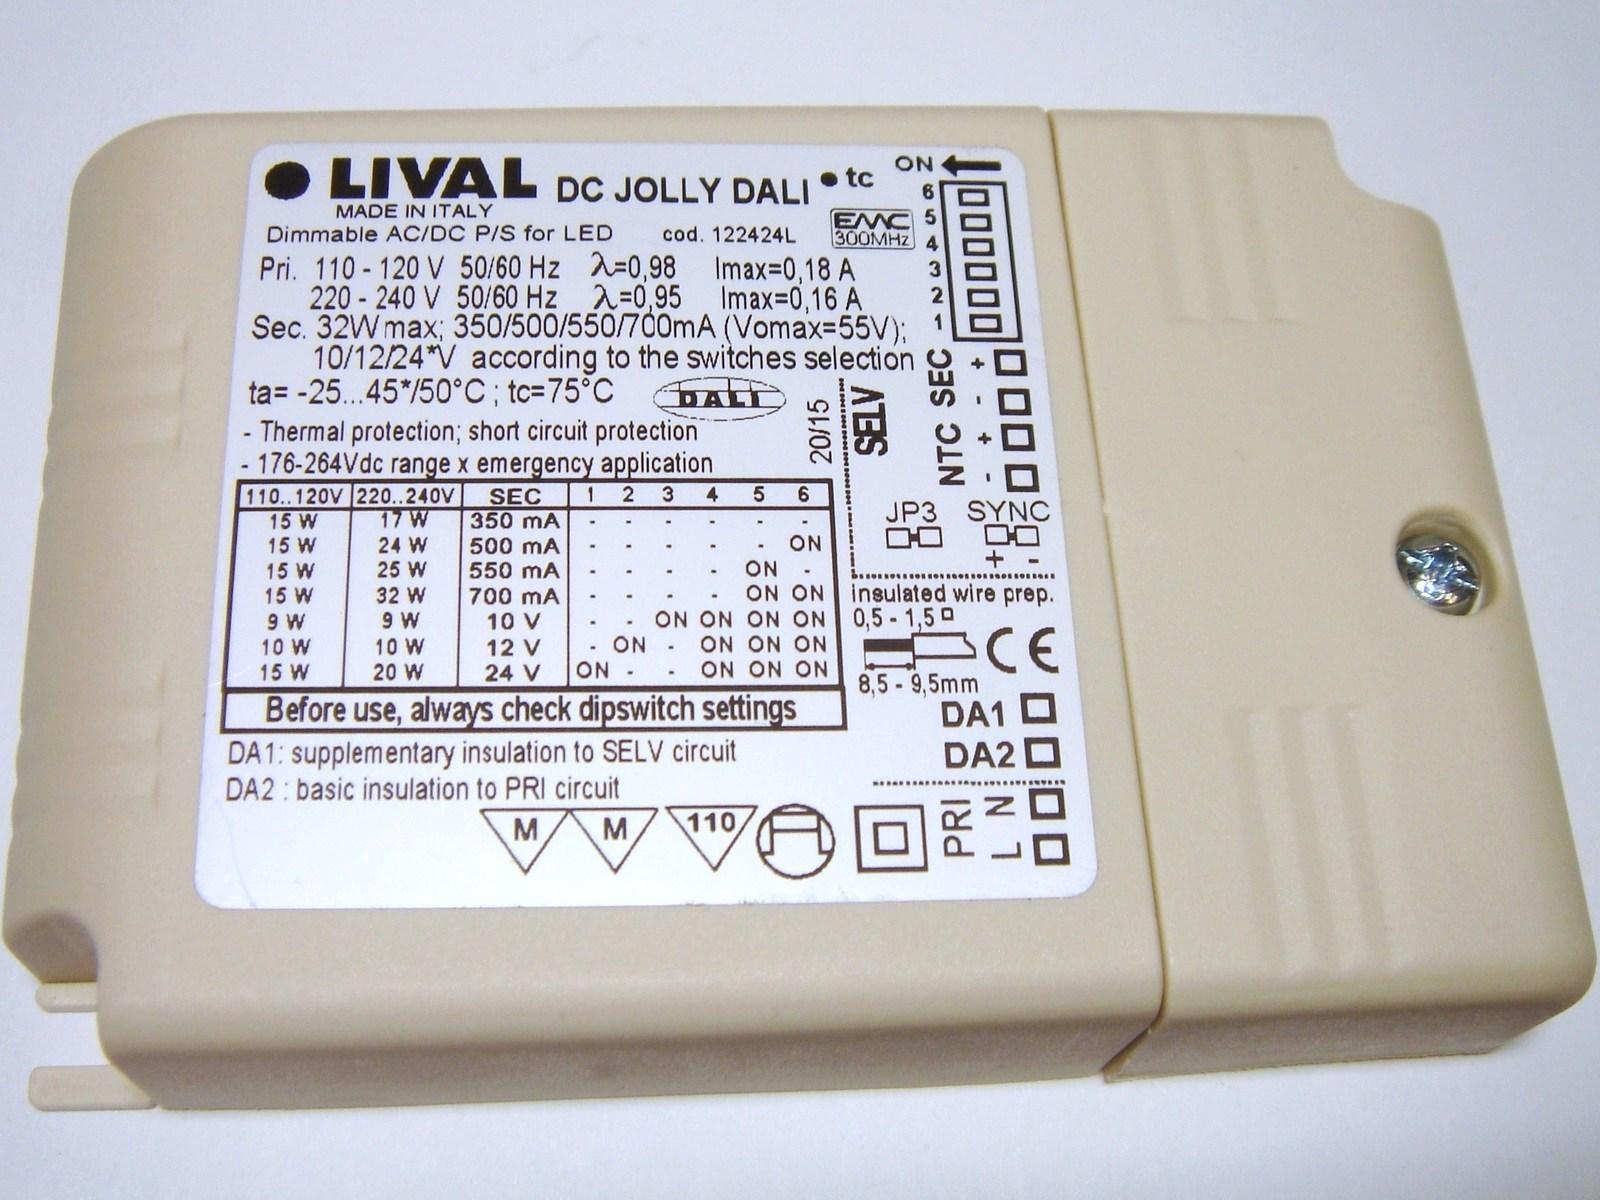 Elektrooniline  LED  trafo 9-32W, 350-700mA, max. 55V, DC Jolly Dali, 122424L, Lival